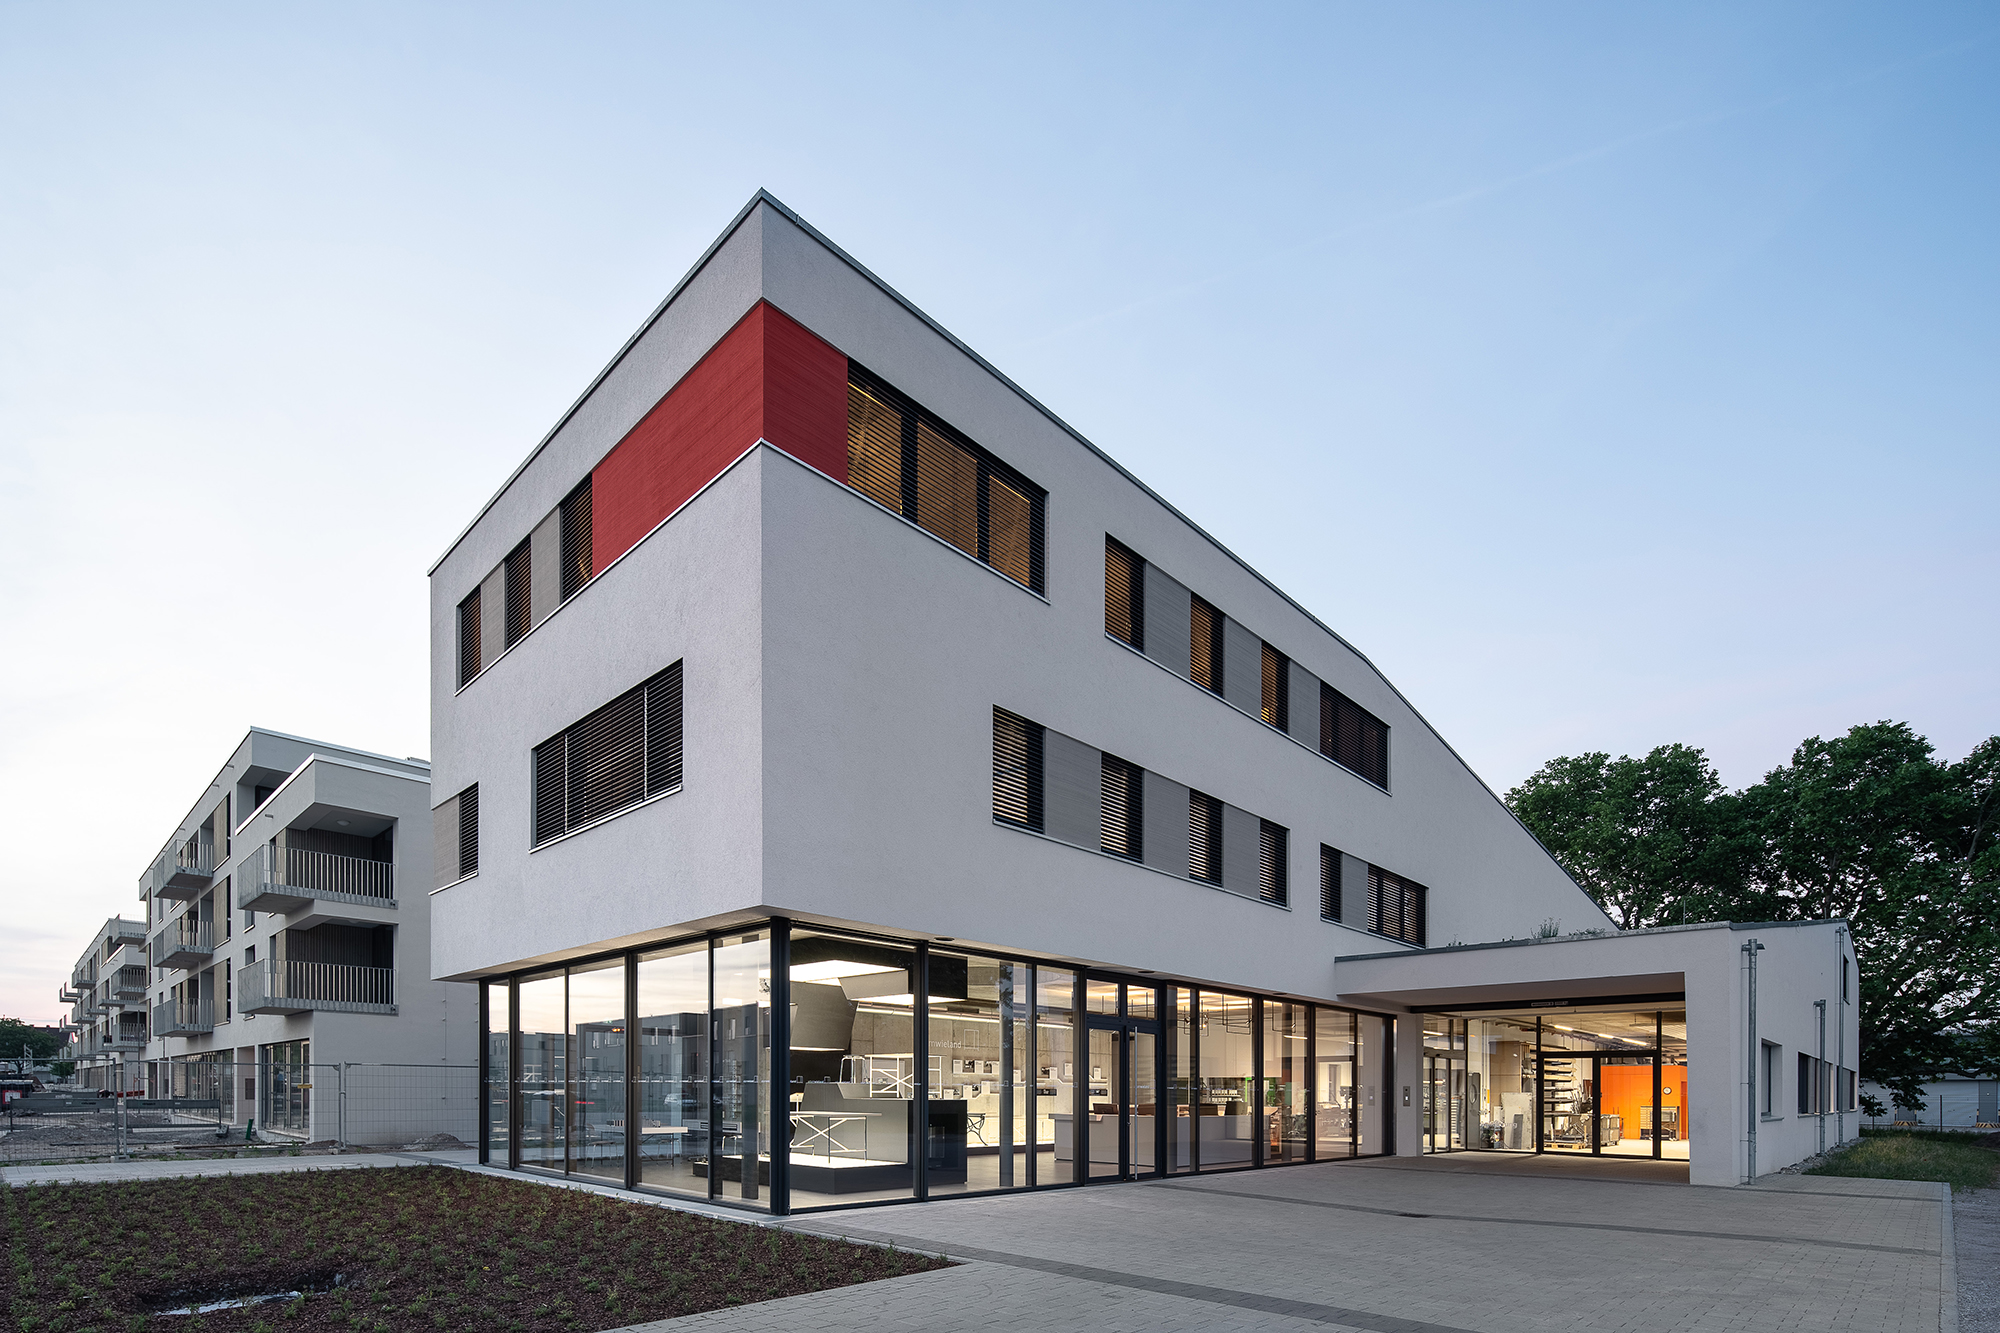 Daniel Vieser . Architekturfotografie, Karlsruhe